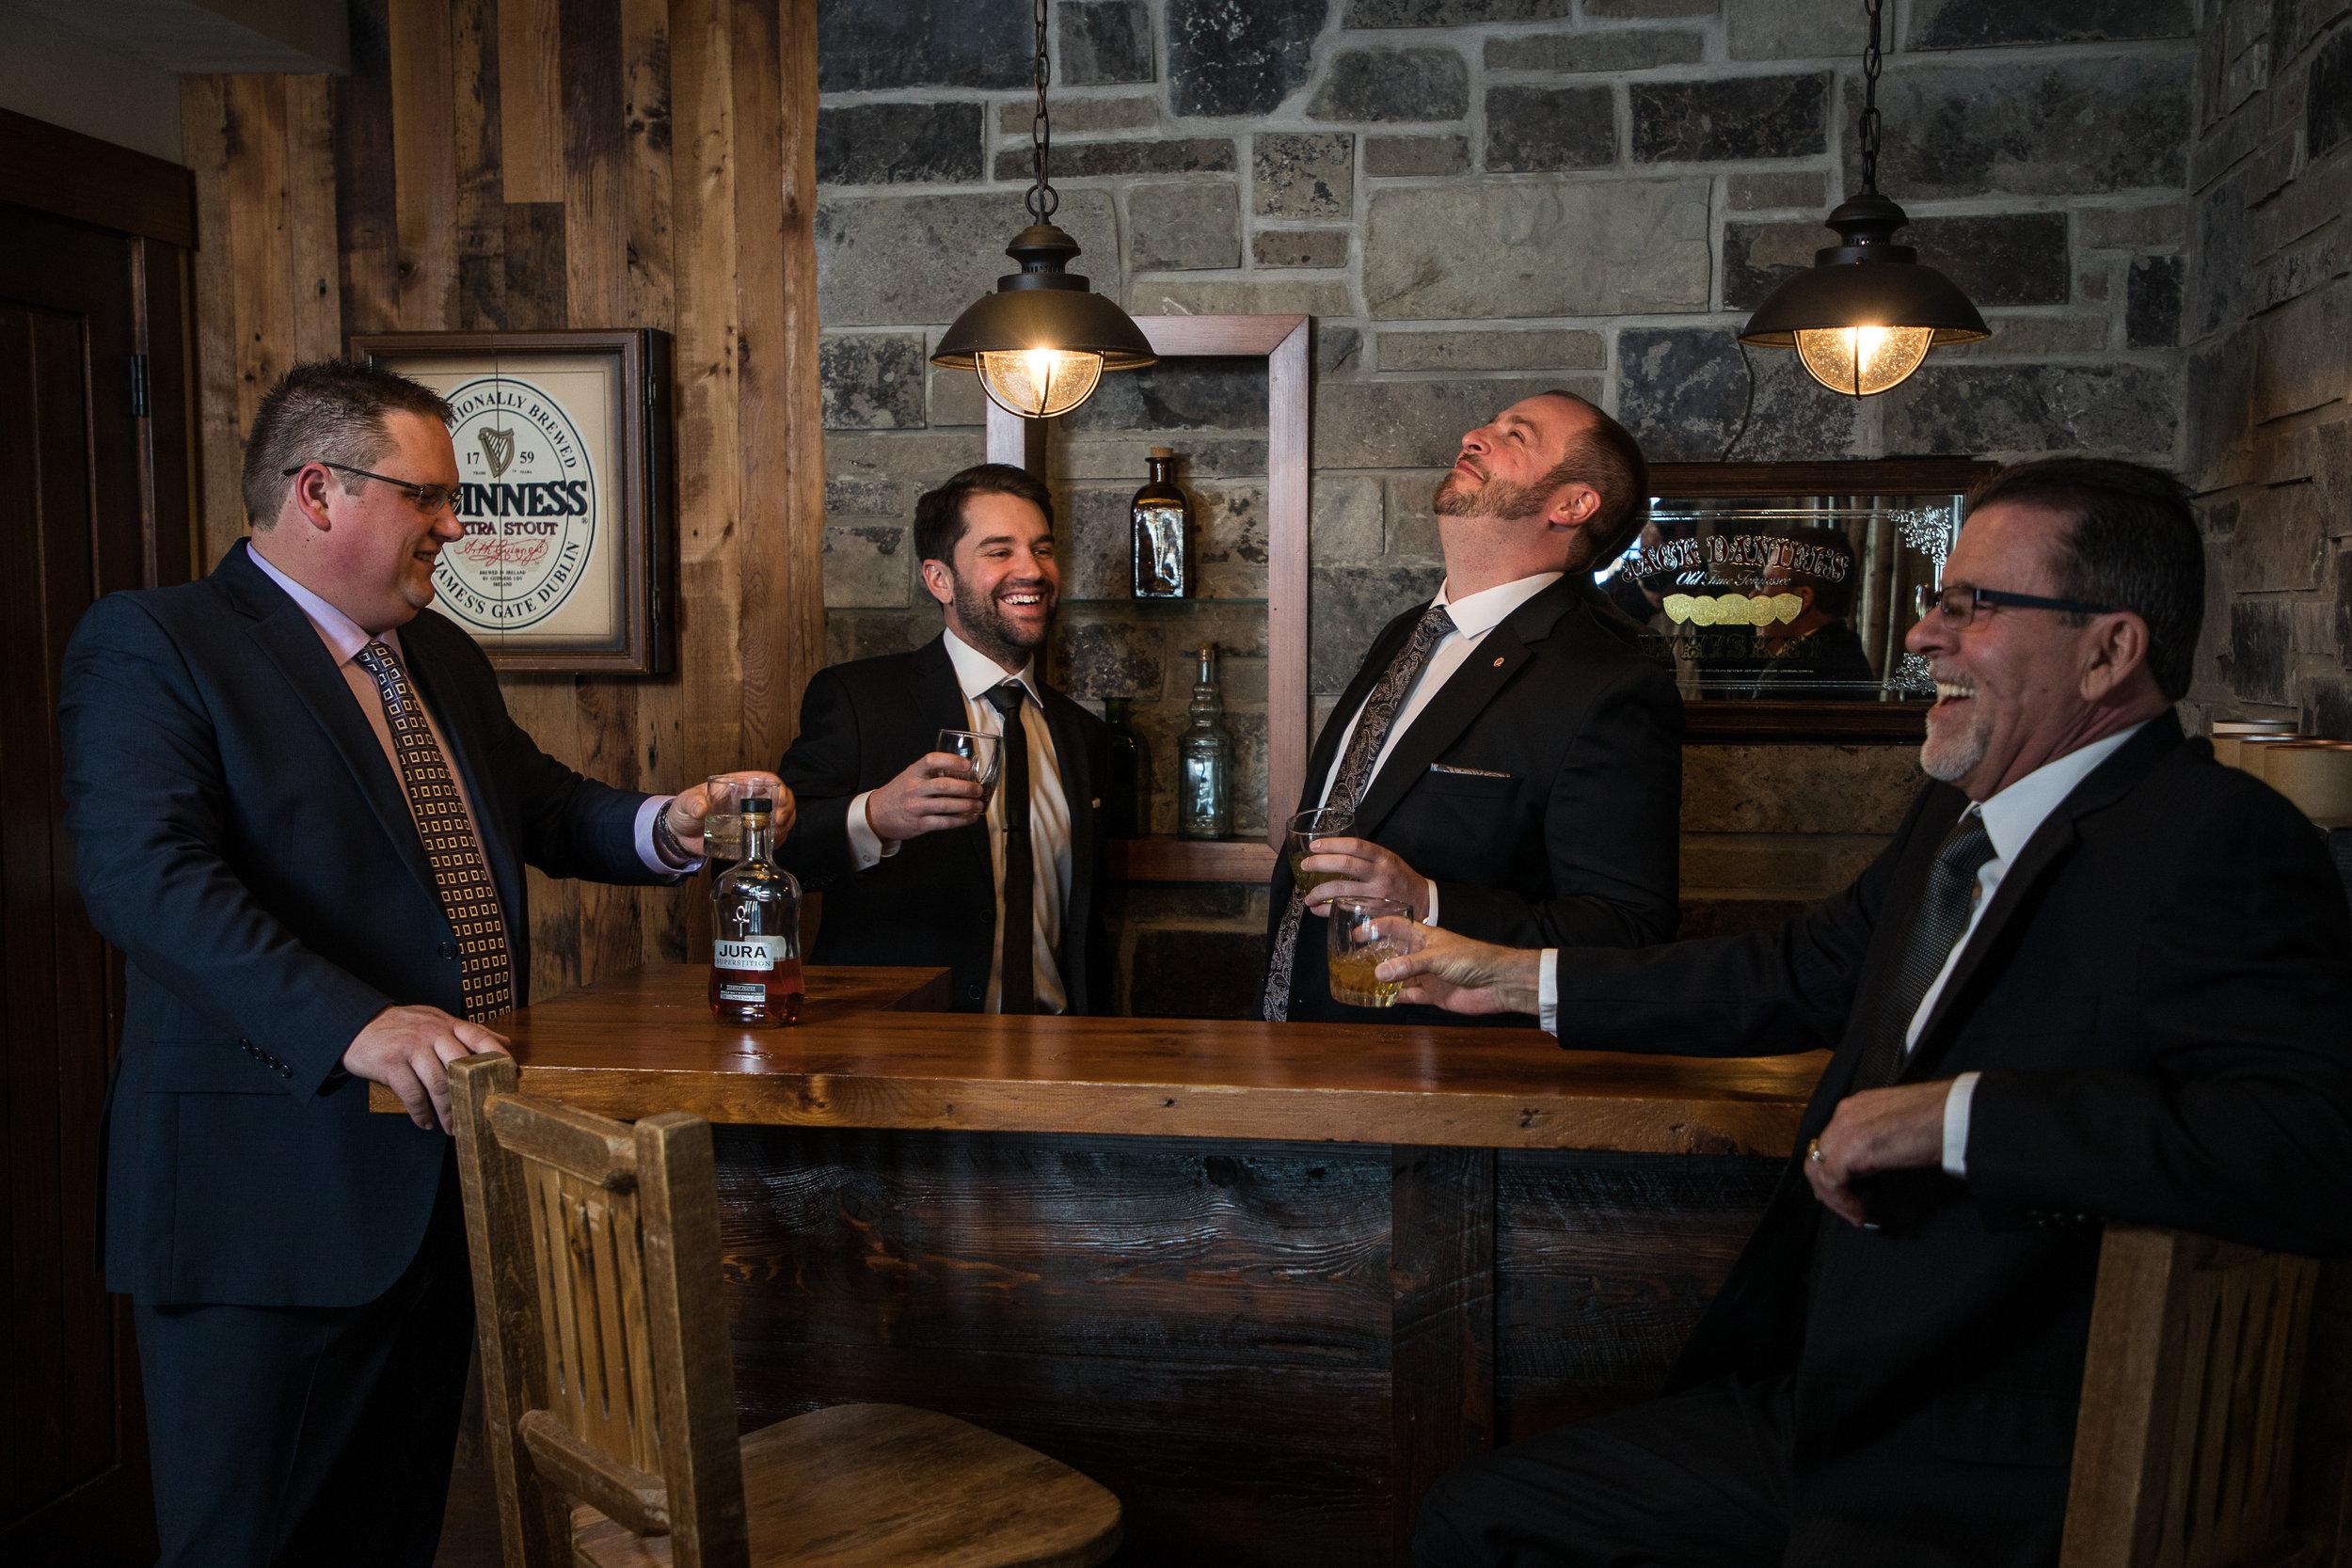 The-Griffiths-Wedding-10-03-10-24.jpg